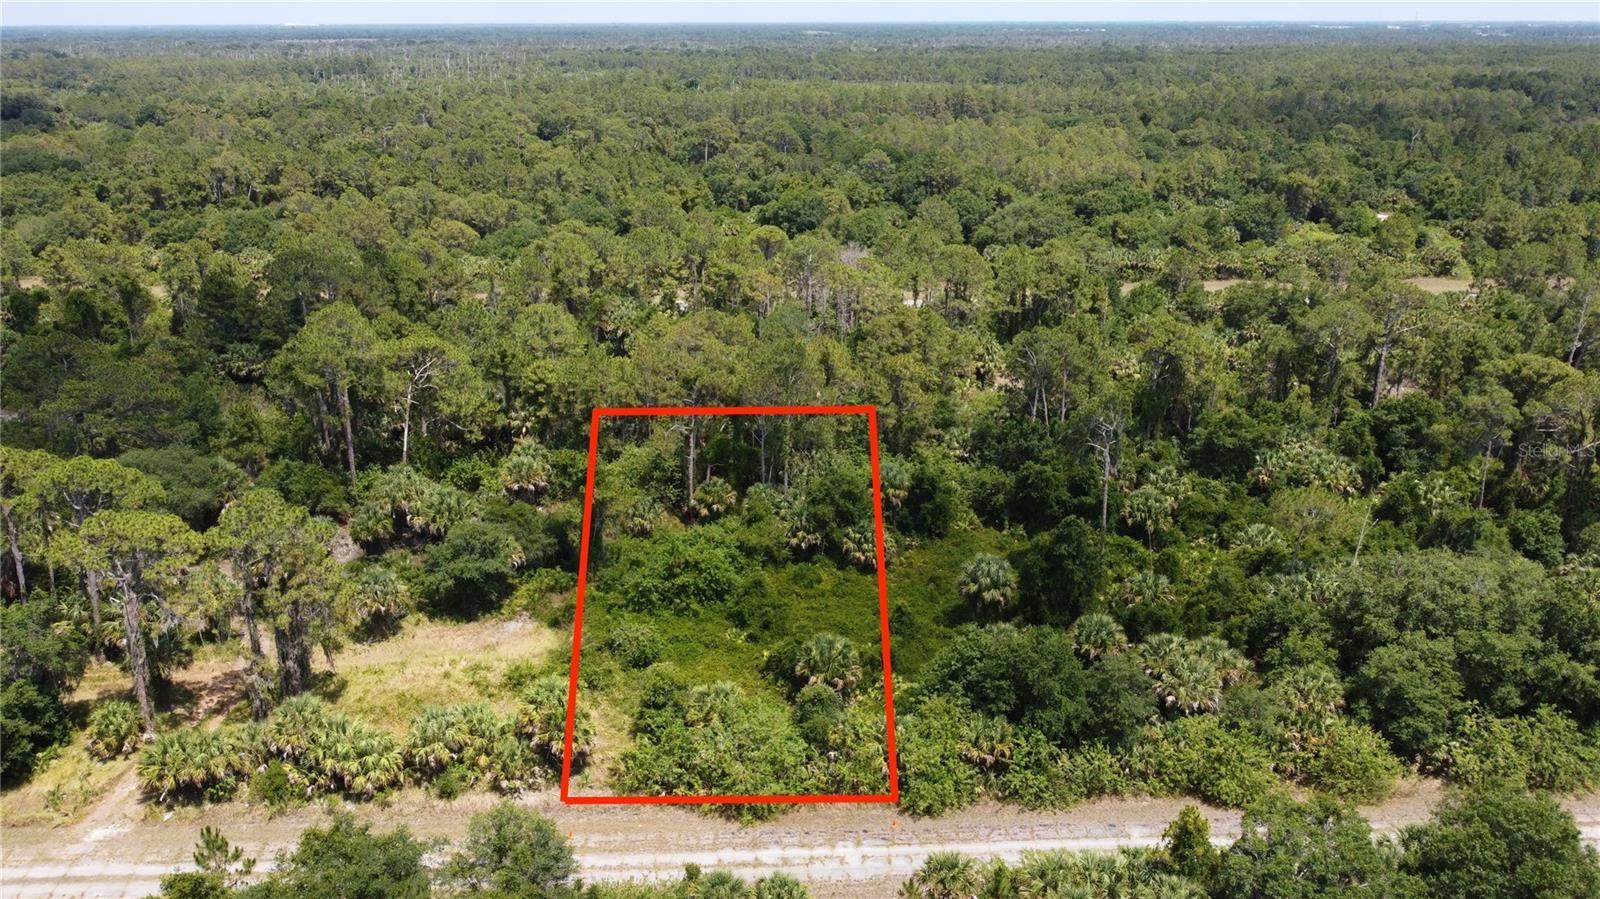 Photo of Lot 10 CLIMBING TER, NORTH PORT, FL 34288 (MLS # A4512829)